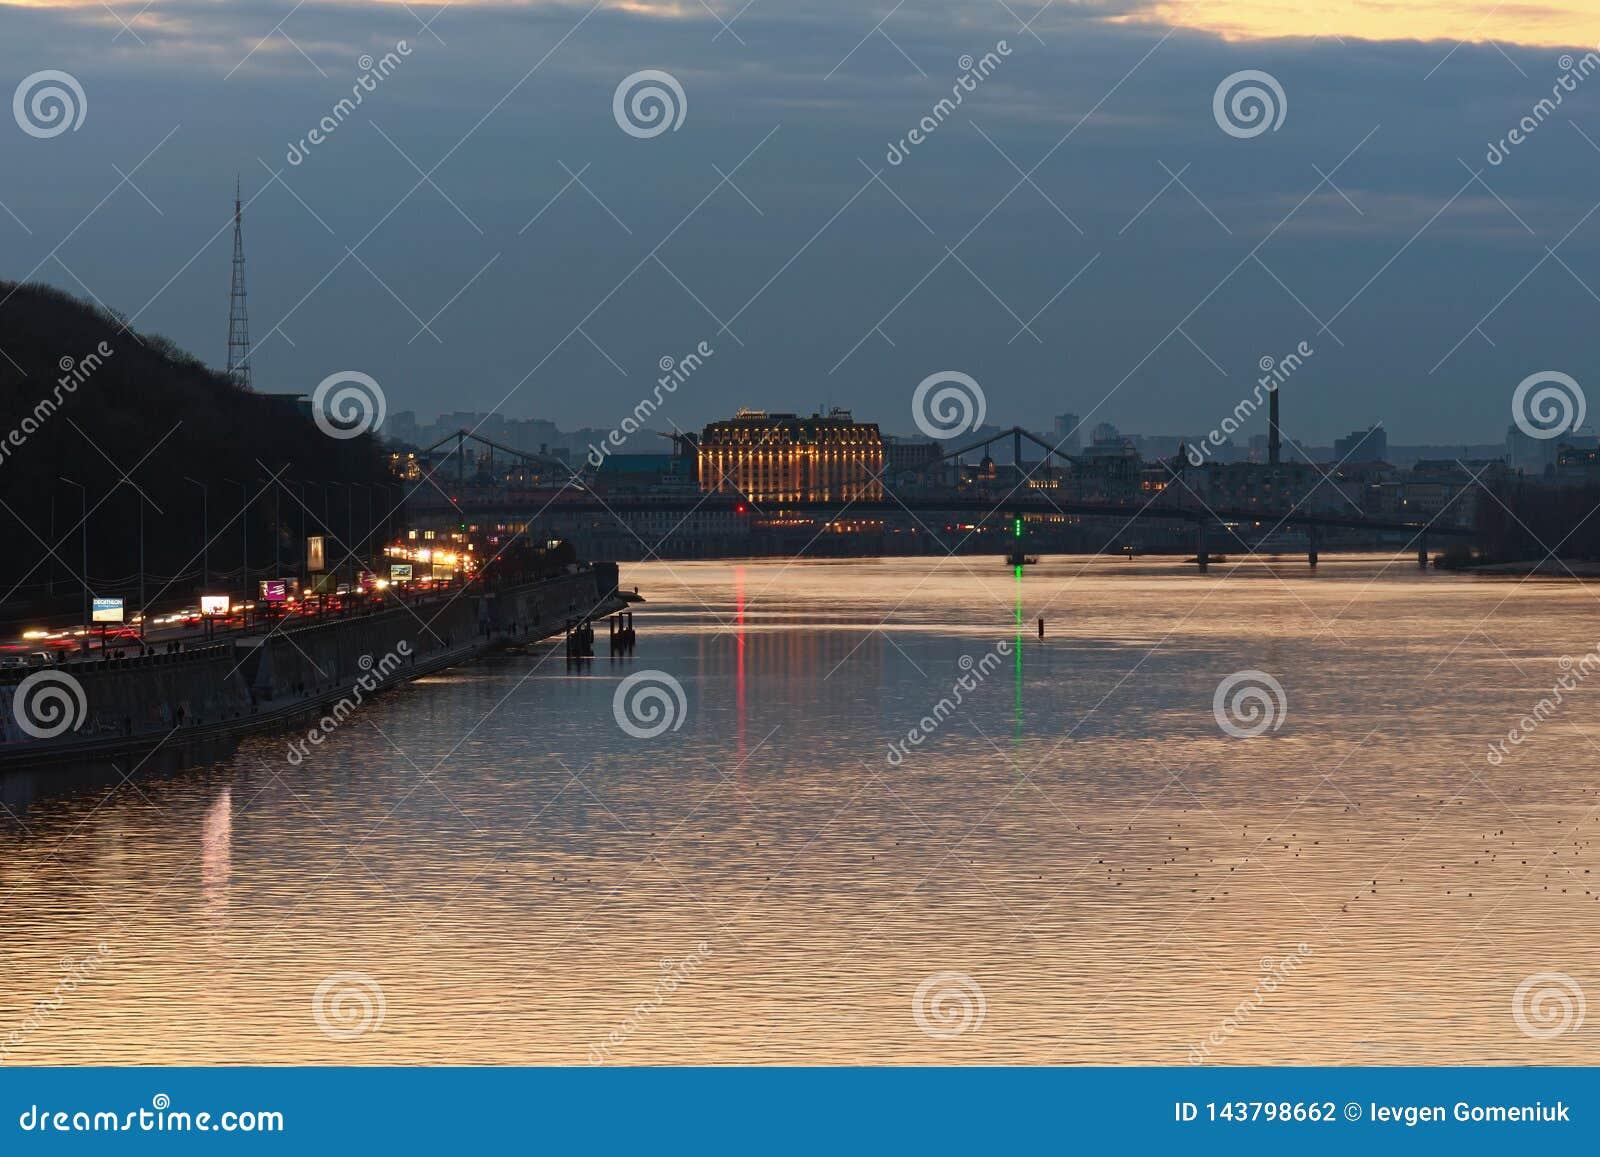 Stunning evening landscape of the Pedestrian bridge over Dnipro River